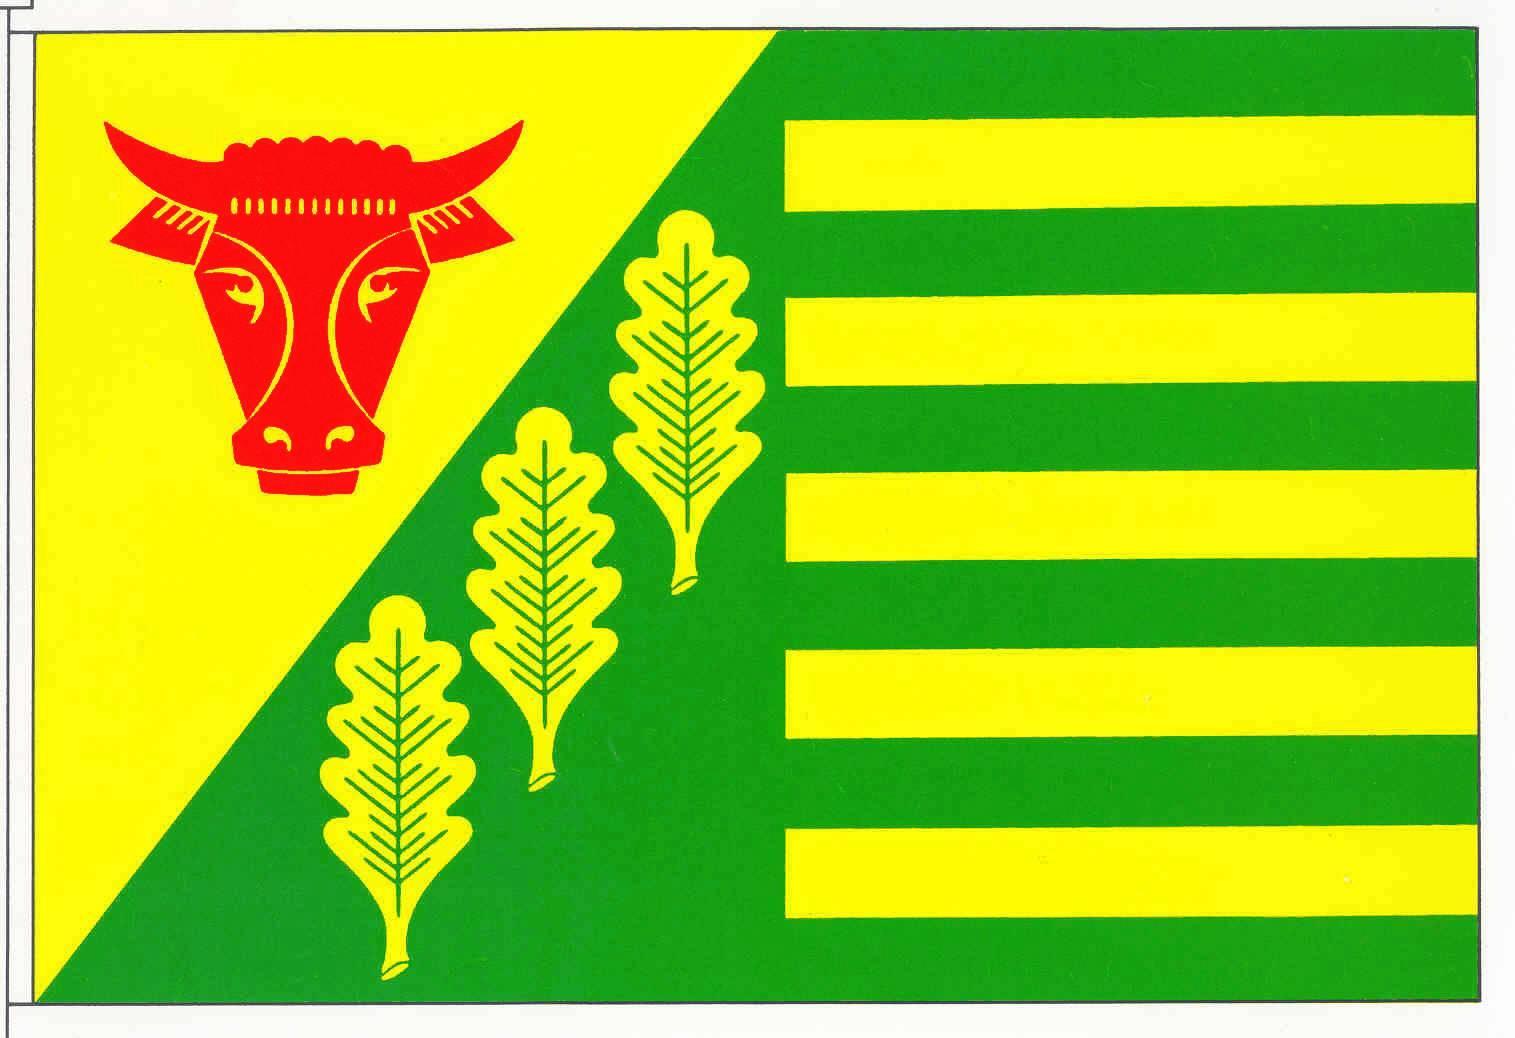 Flagge GemeindeKropp, Kreis Schleswig-Flensburg